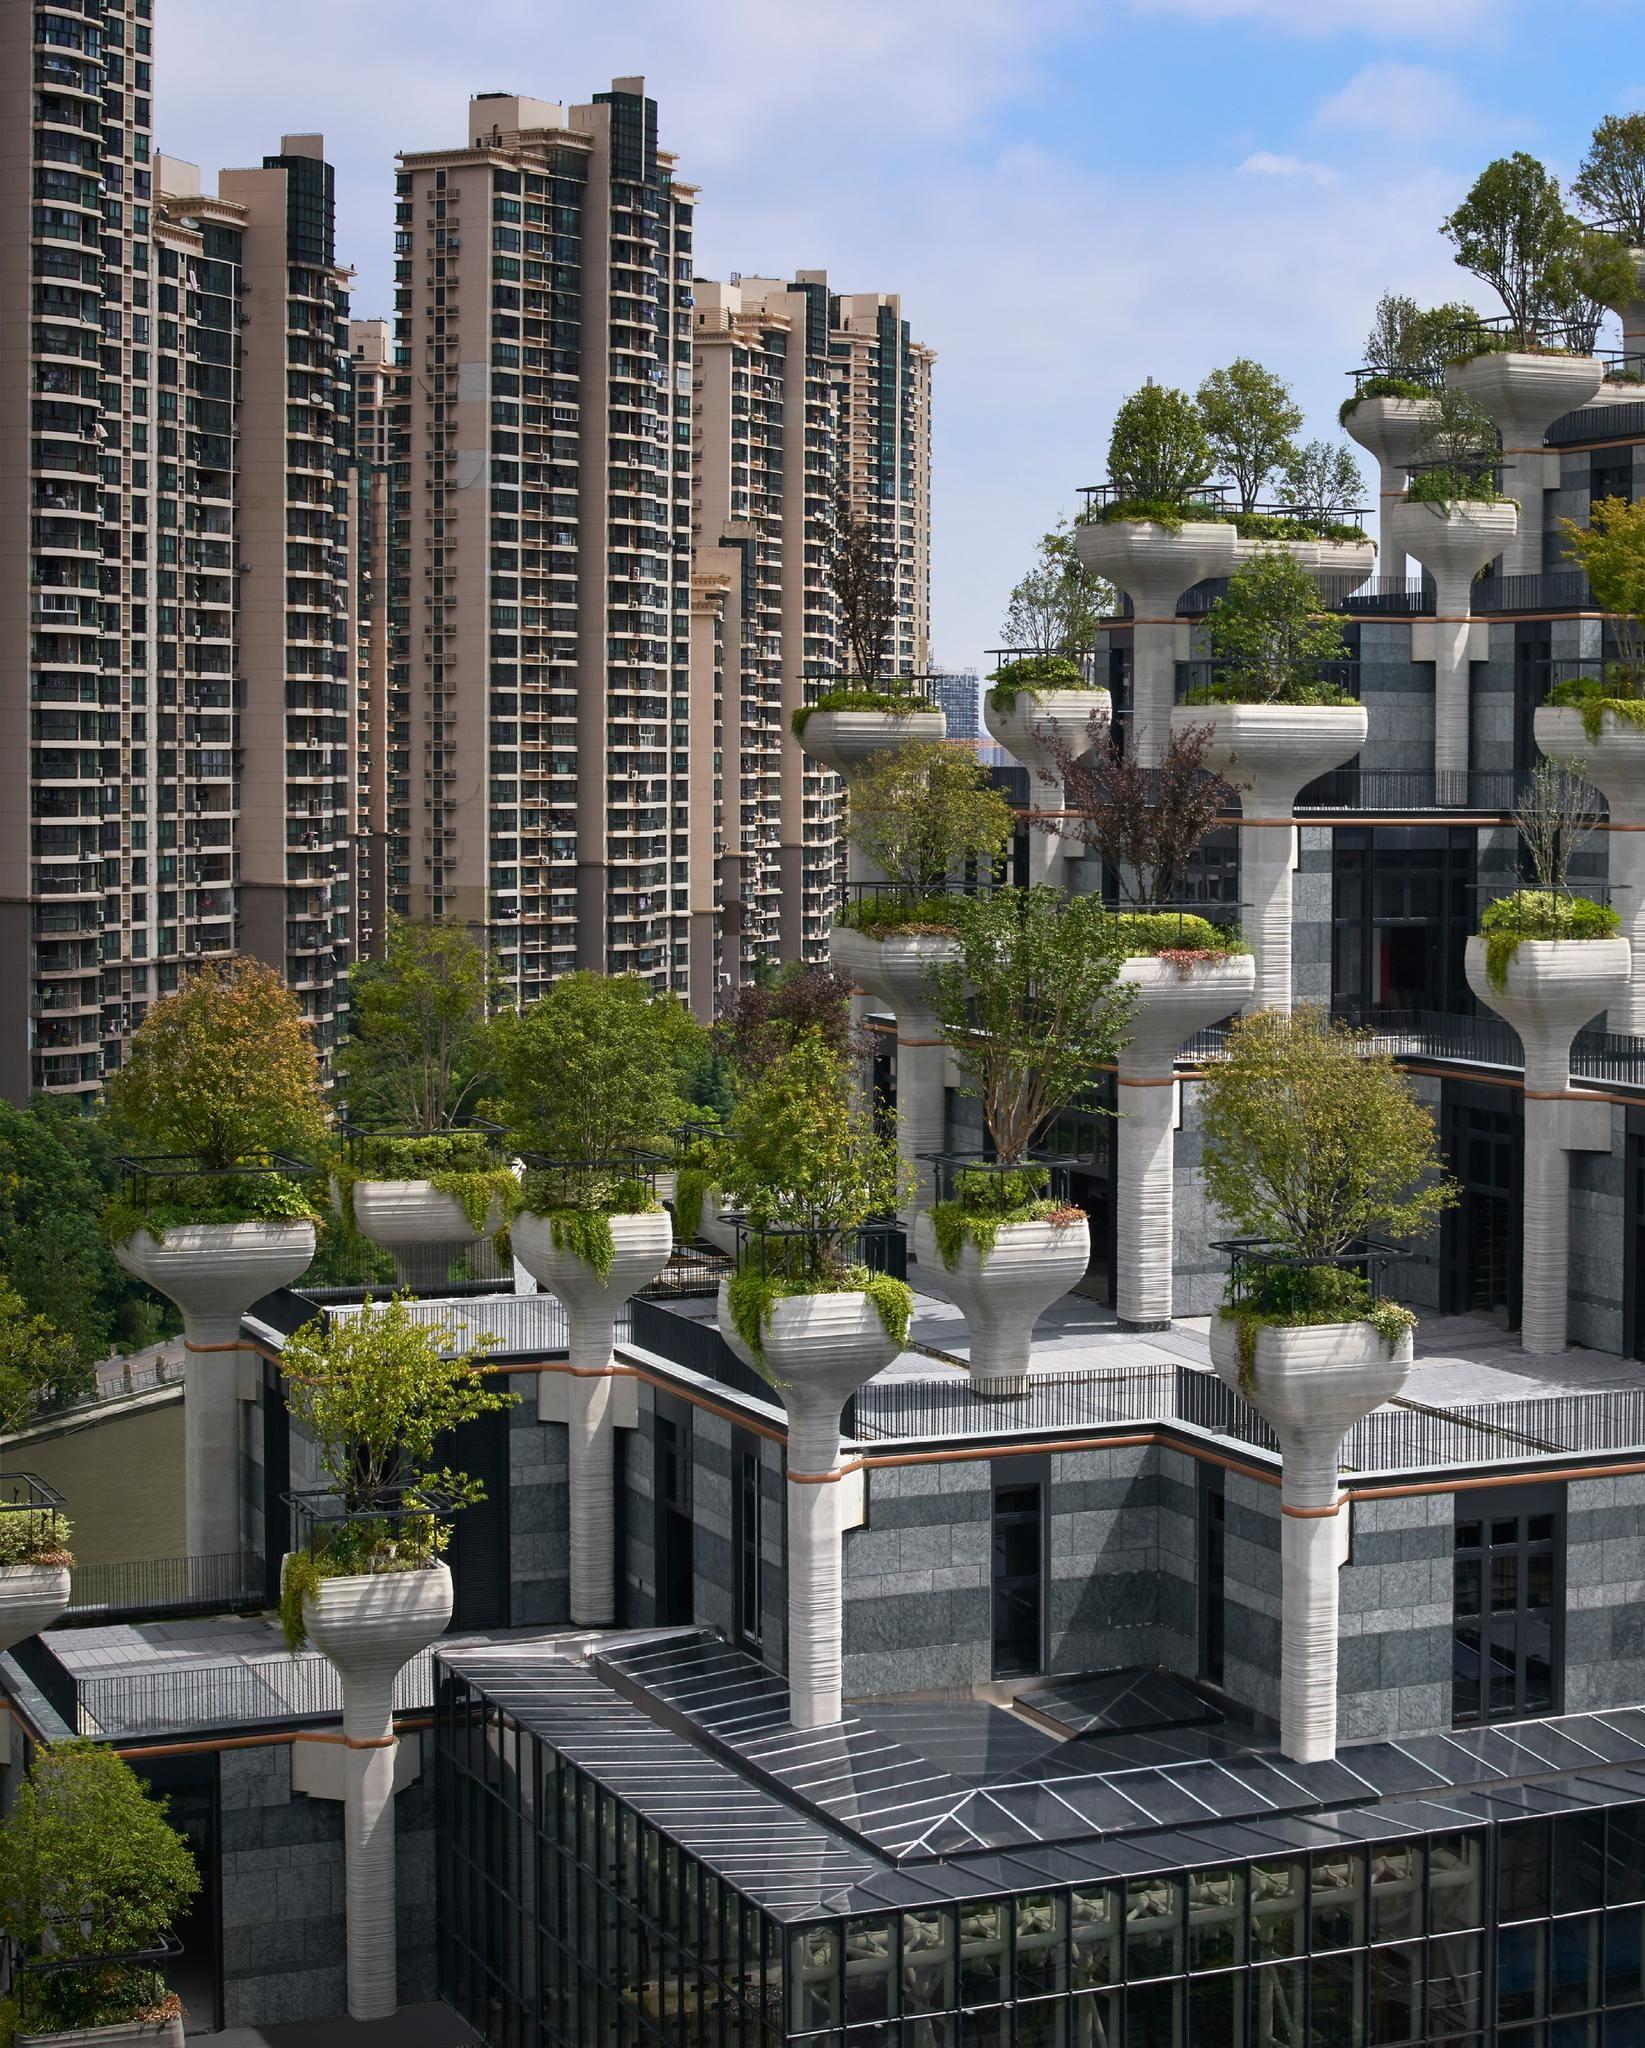 Heatherwick Studio reveals 1,000 Trees nearing completion in Shanghai